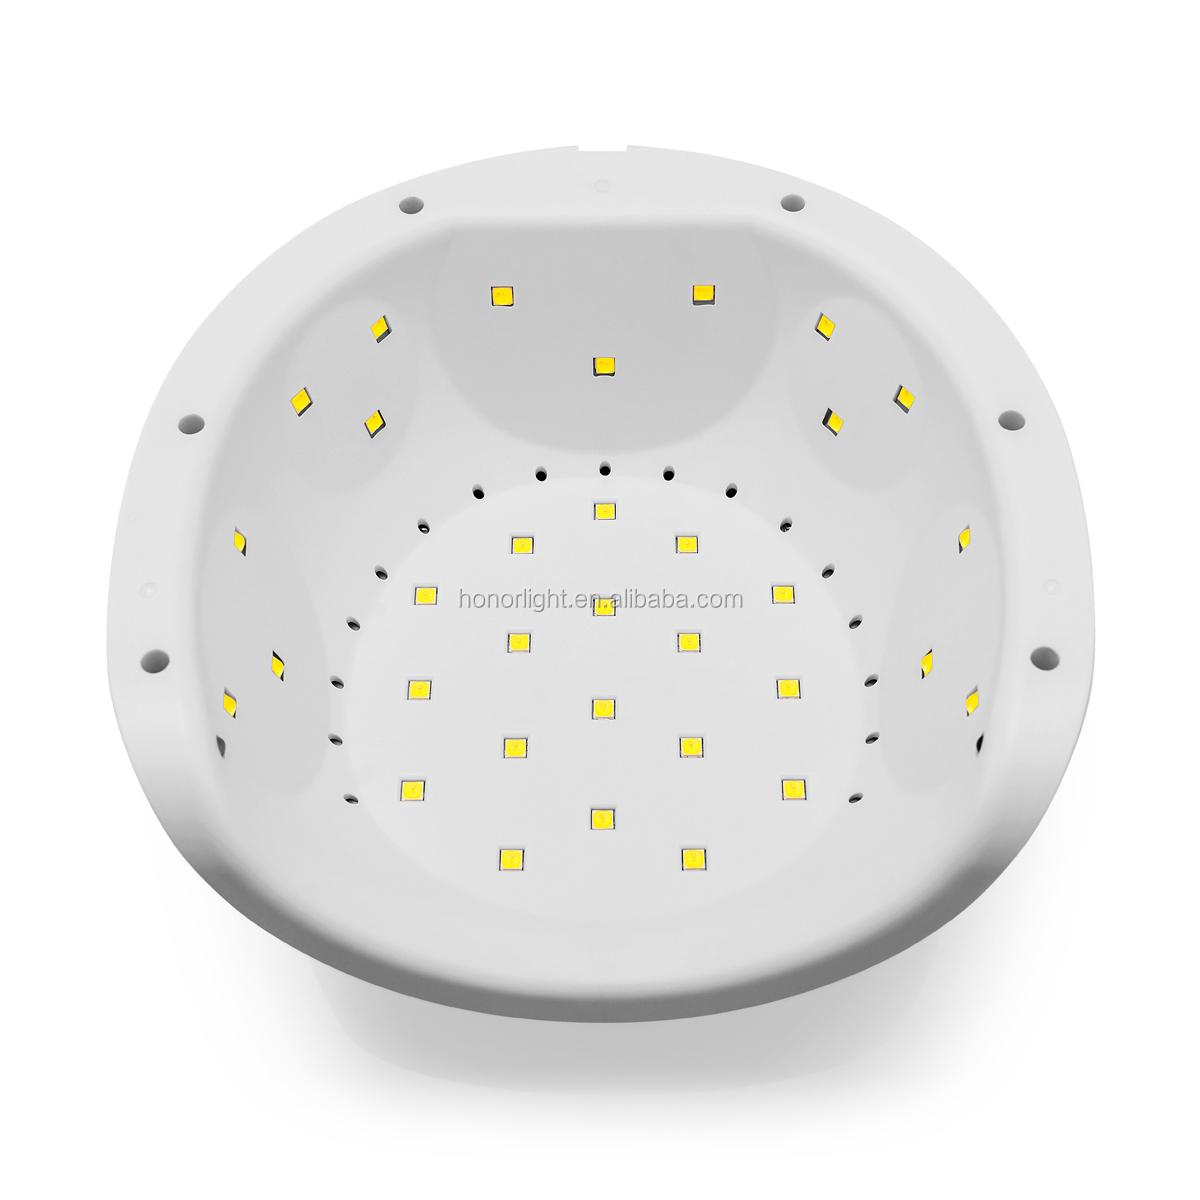 Fabricants Kodi Professionnel Uv Rechercher Led Les Des Lampe 8vmN0nwO